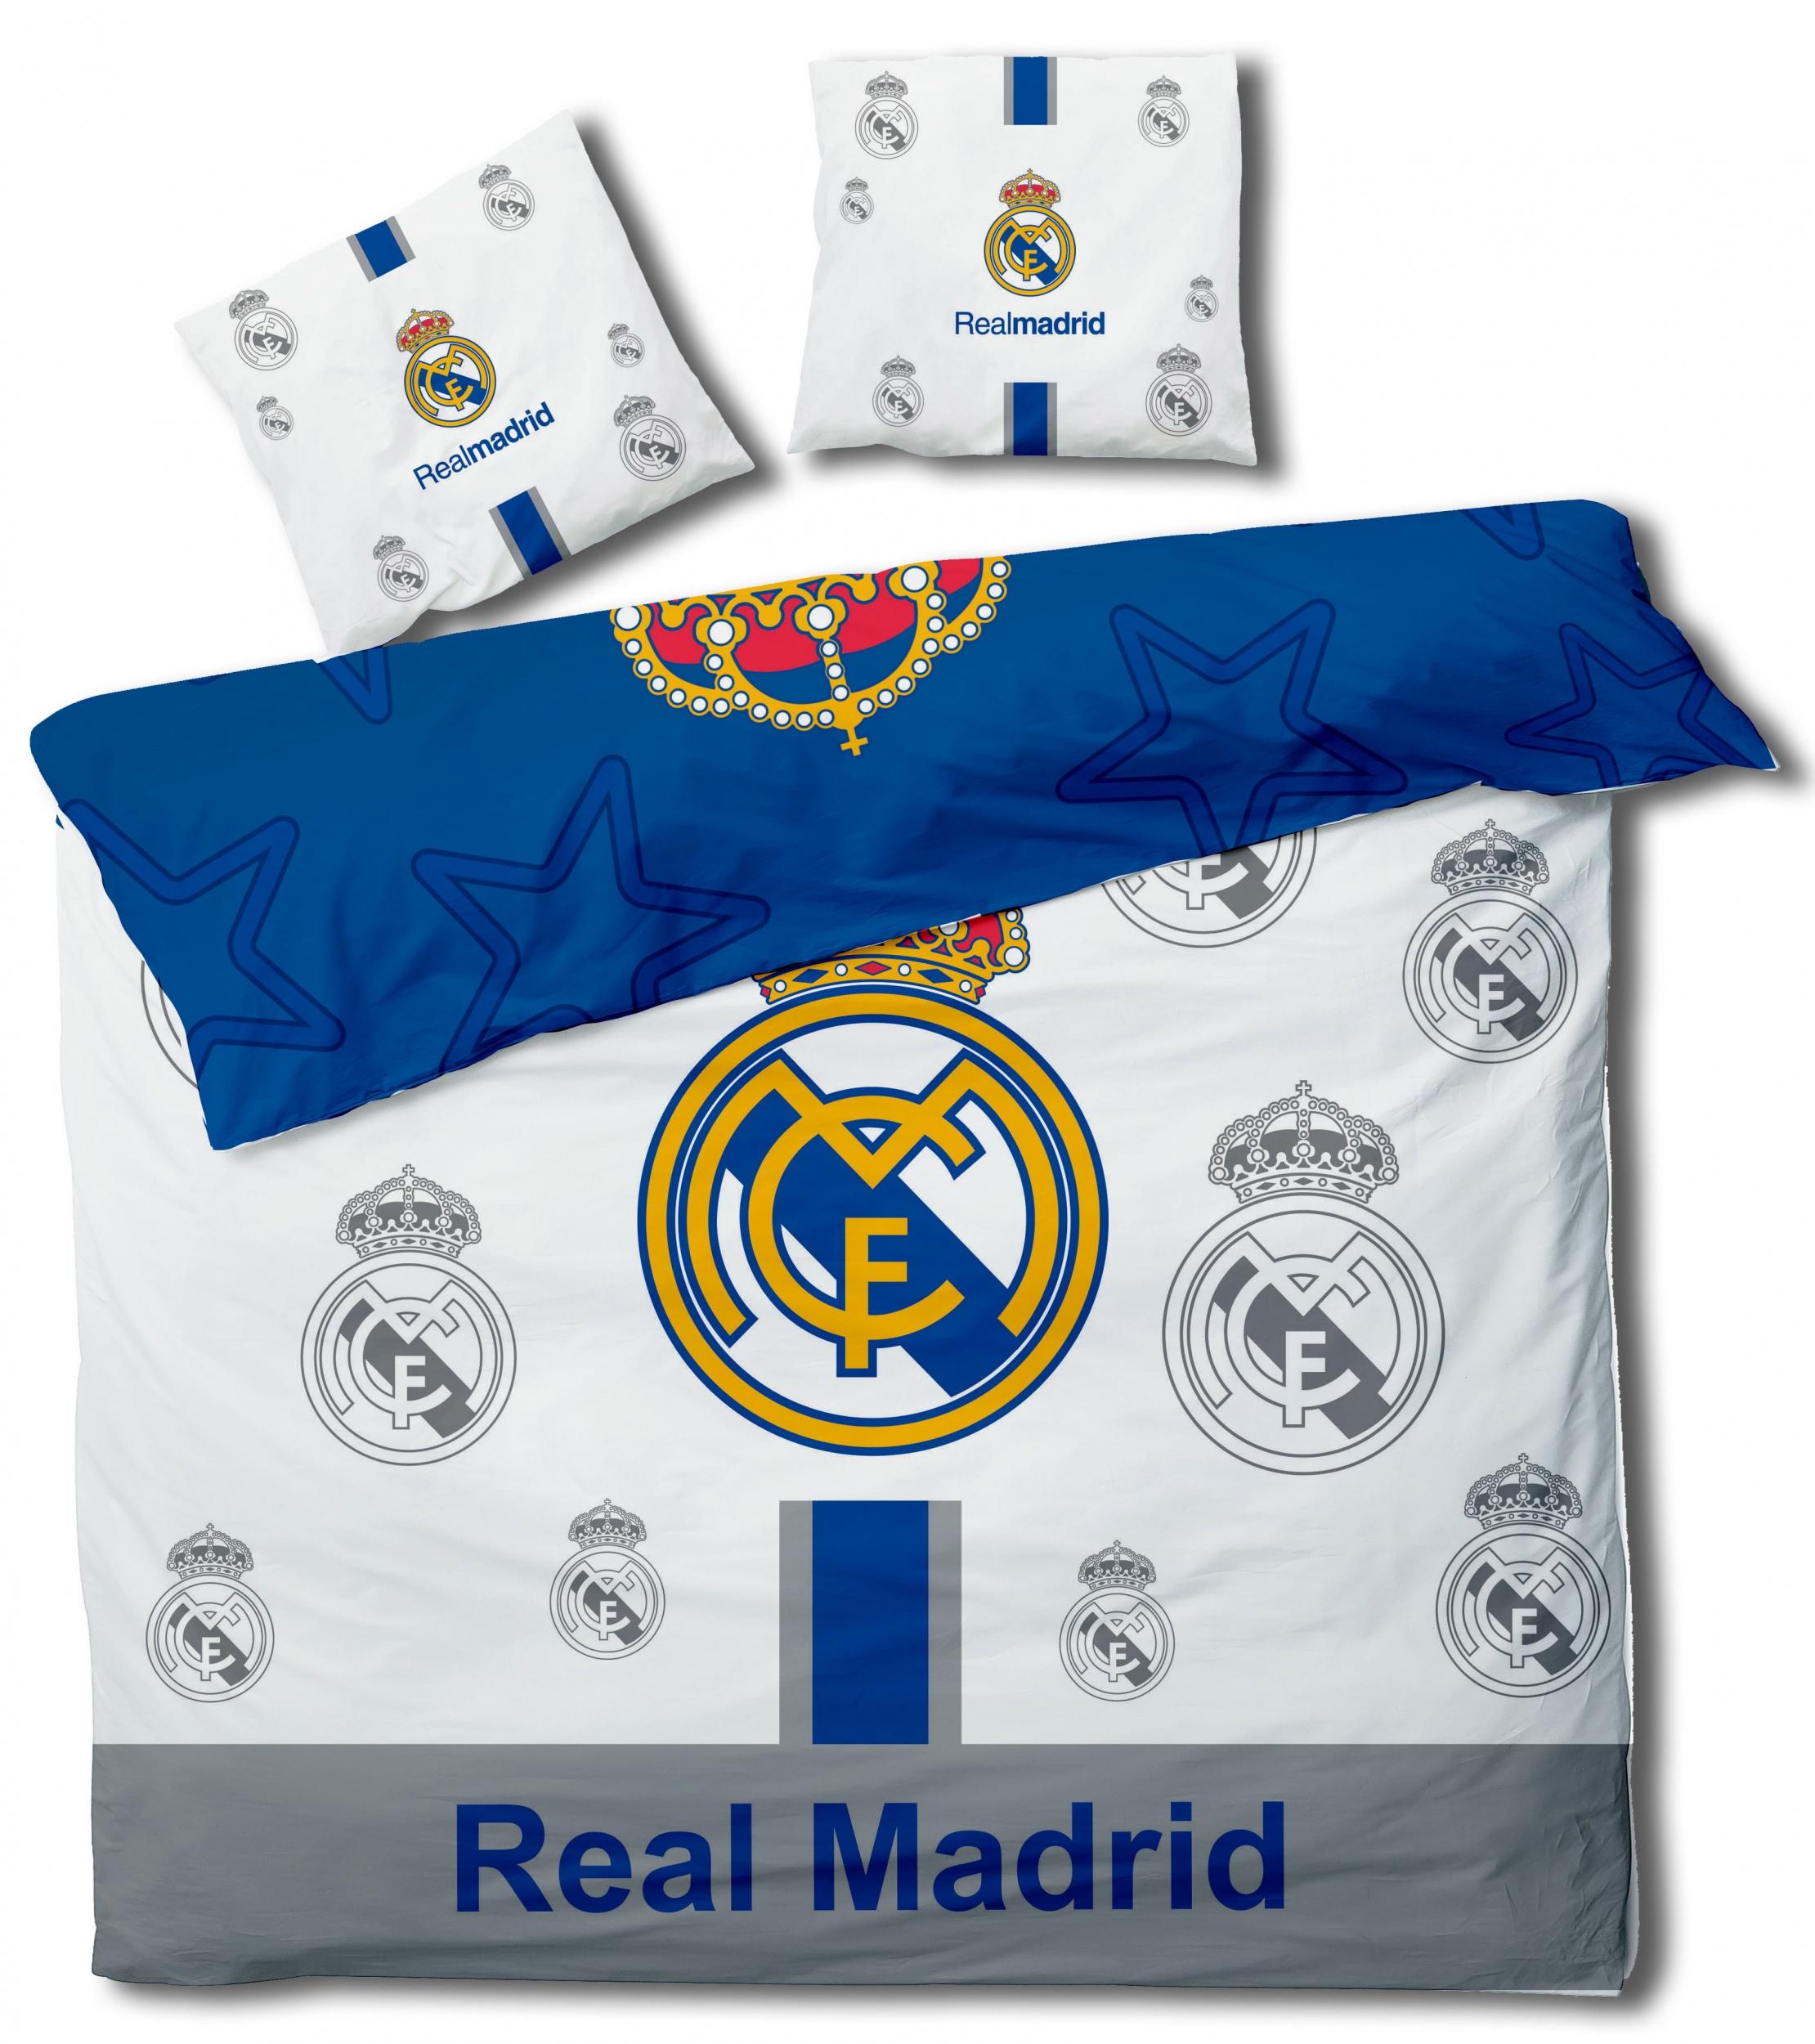 Blauw Wit Dekbedovertrek.Real Madrid Dekbedovertrek Real Madrid Wit Blauw 240 X 220 Cm Giga